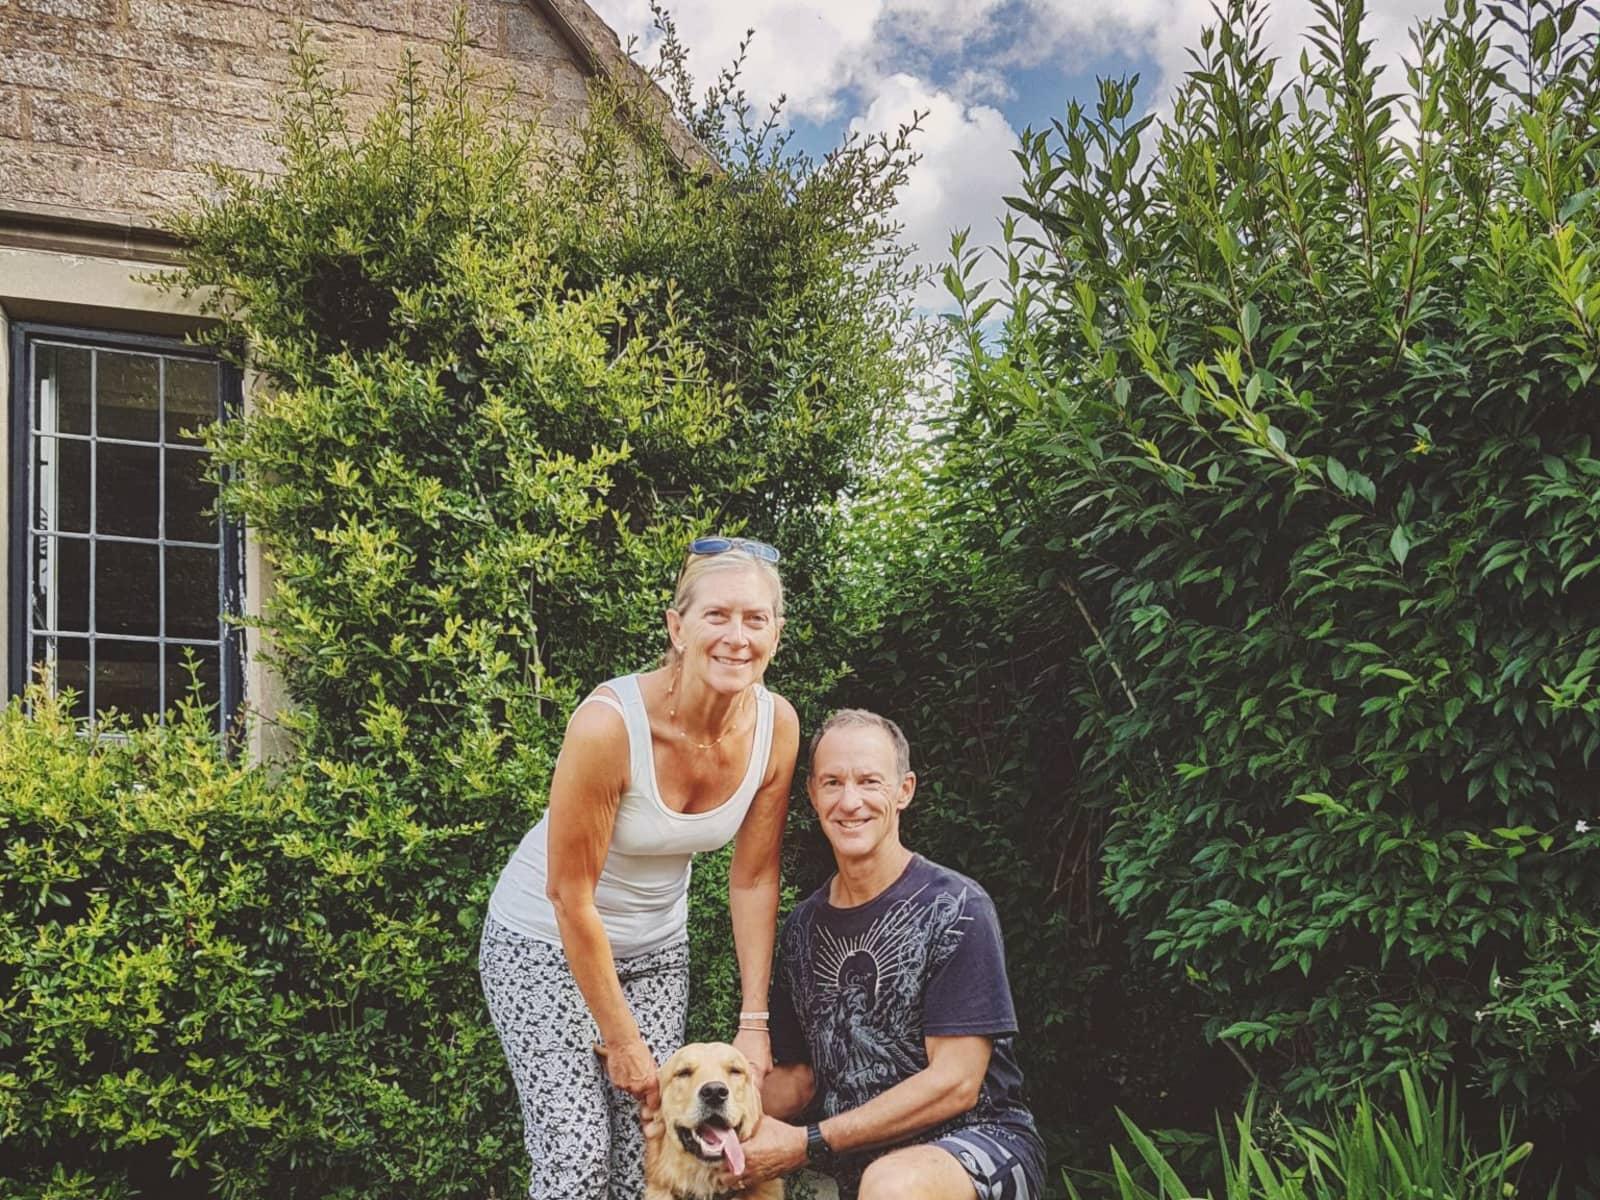 Linda & Nigel from Launceston, Tasmania, Australia